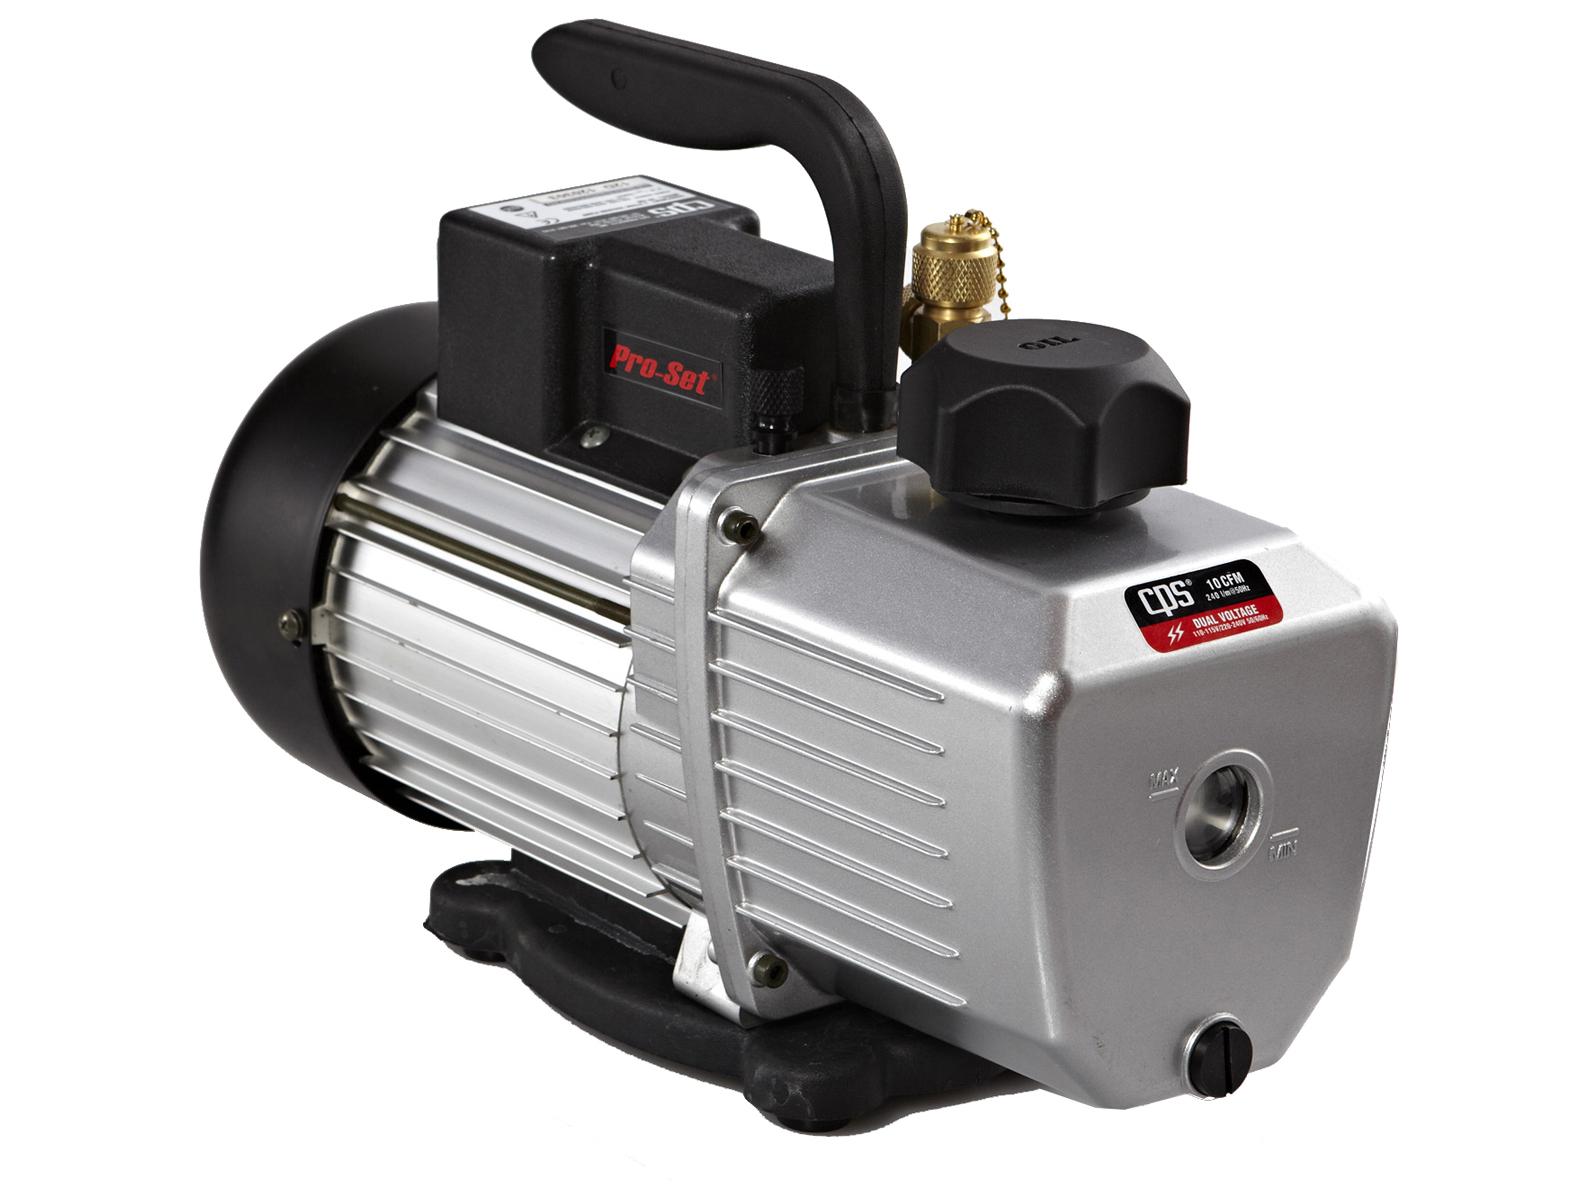 Vp10d Pro Set 174 10 Cfm Vacuum Pump Cps Products Inc